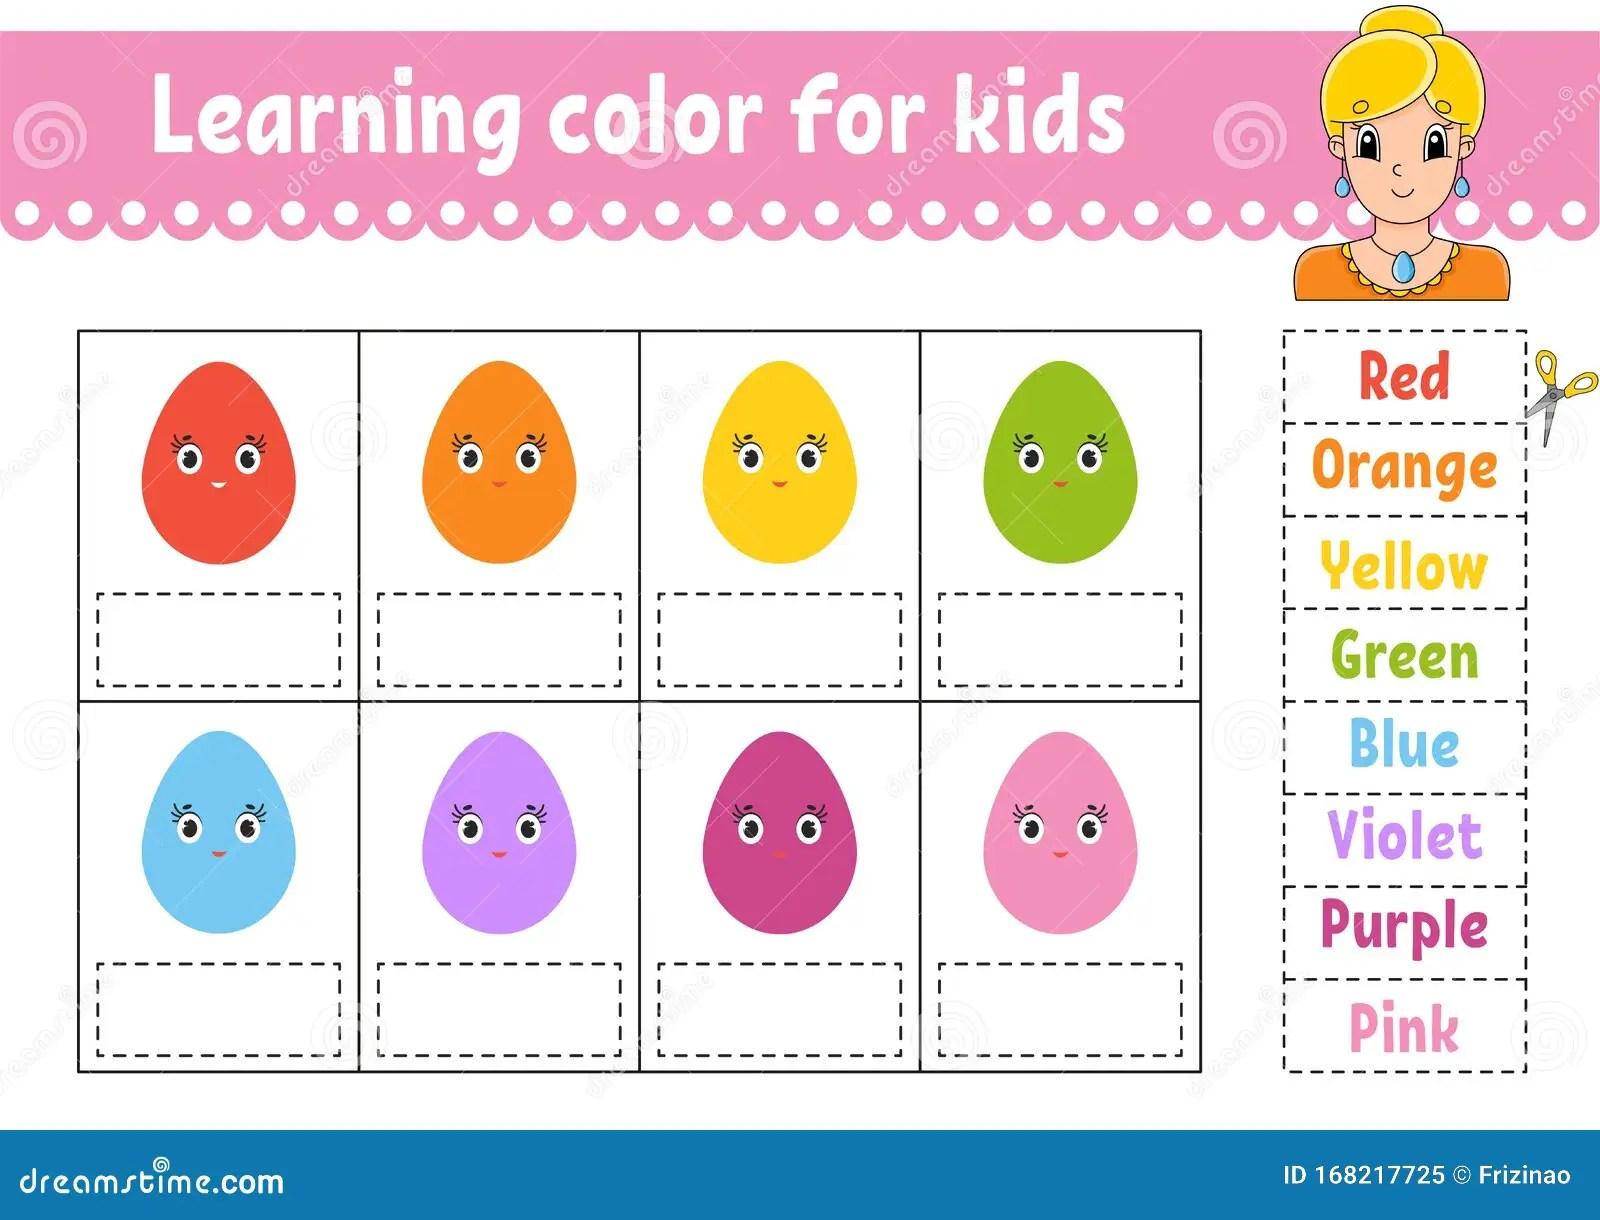 Learning Color For Kids Education Developing Worksheet